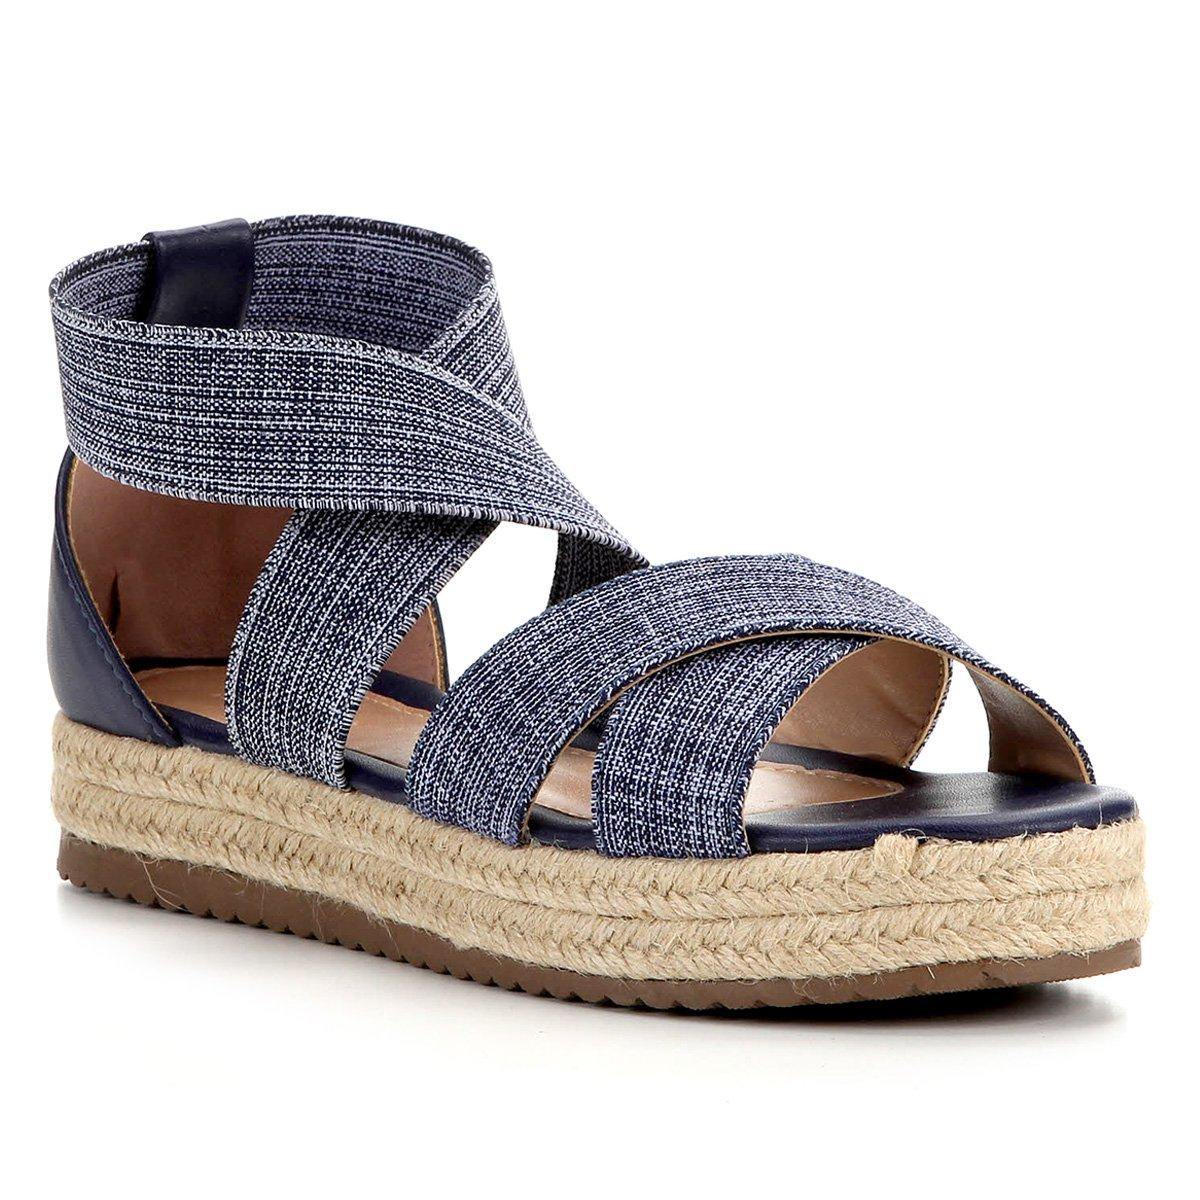 Foto 1 - Sandália Shoestock Flatform Elástico Feminina